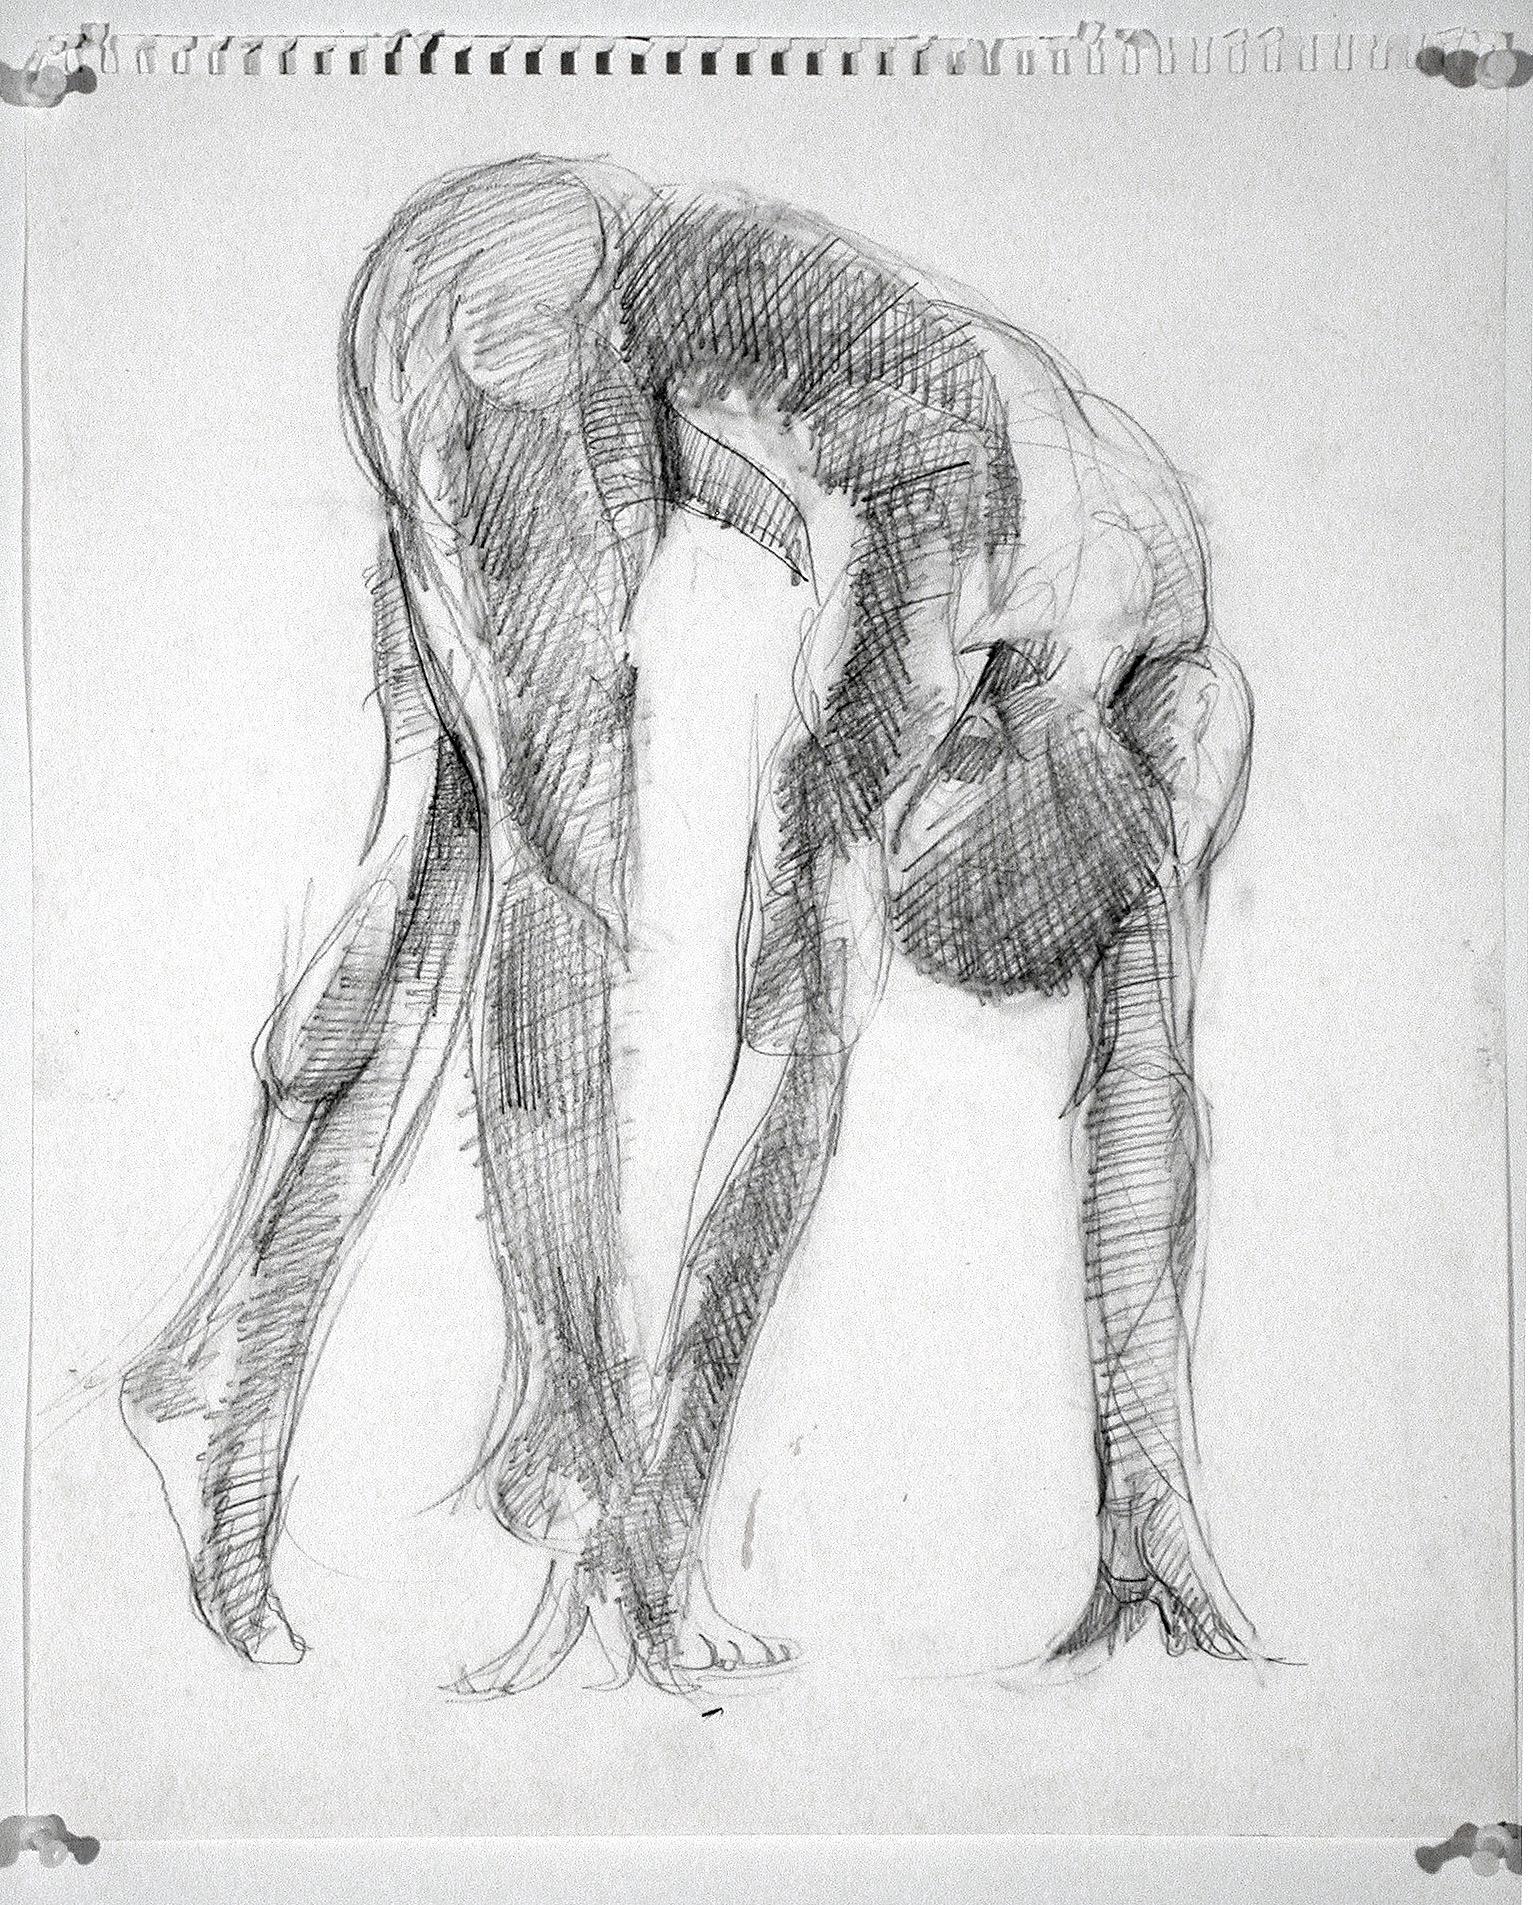 2005  18x12 in  Graphite on paper